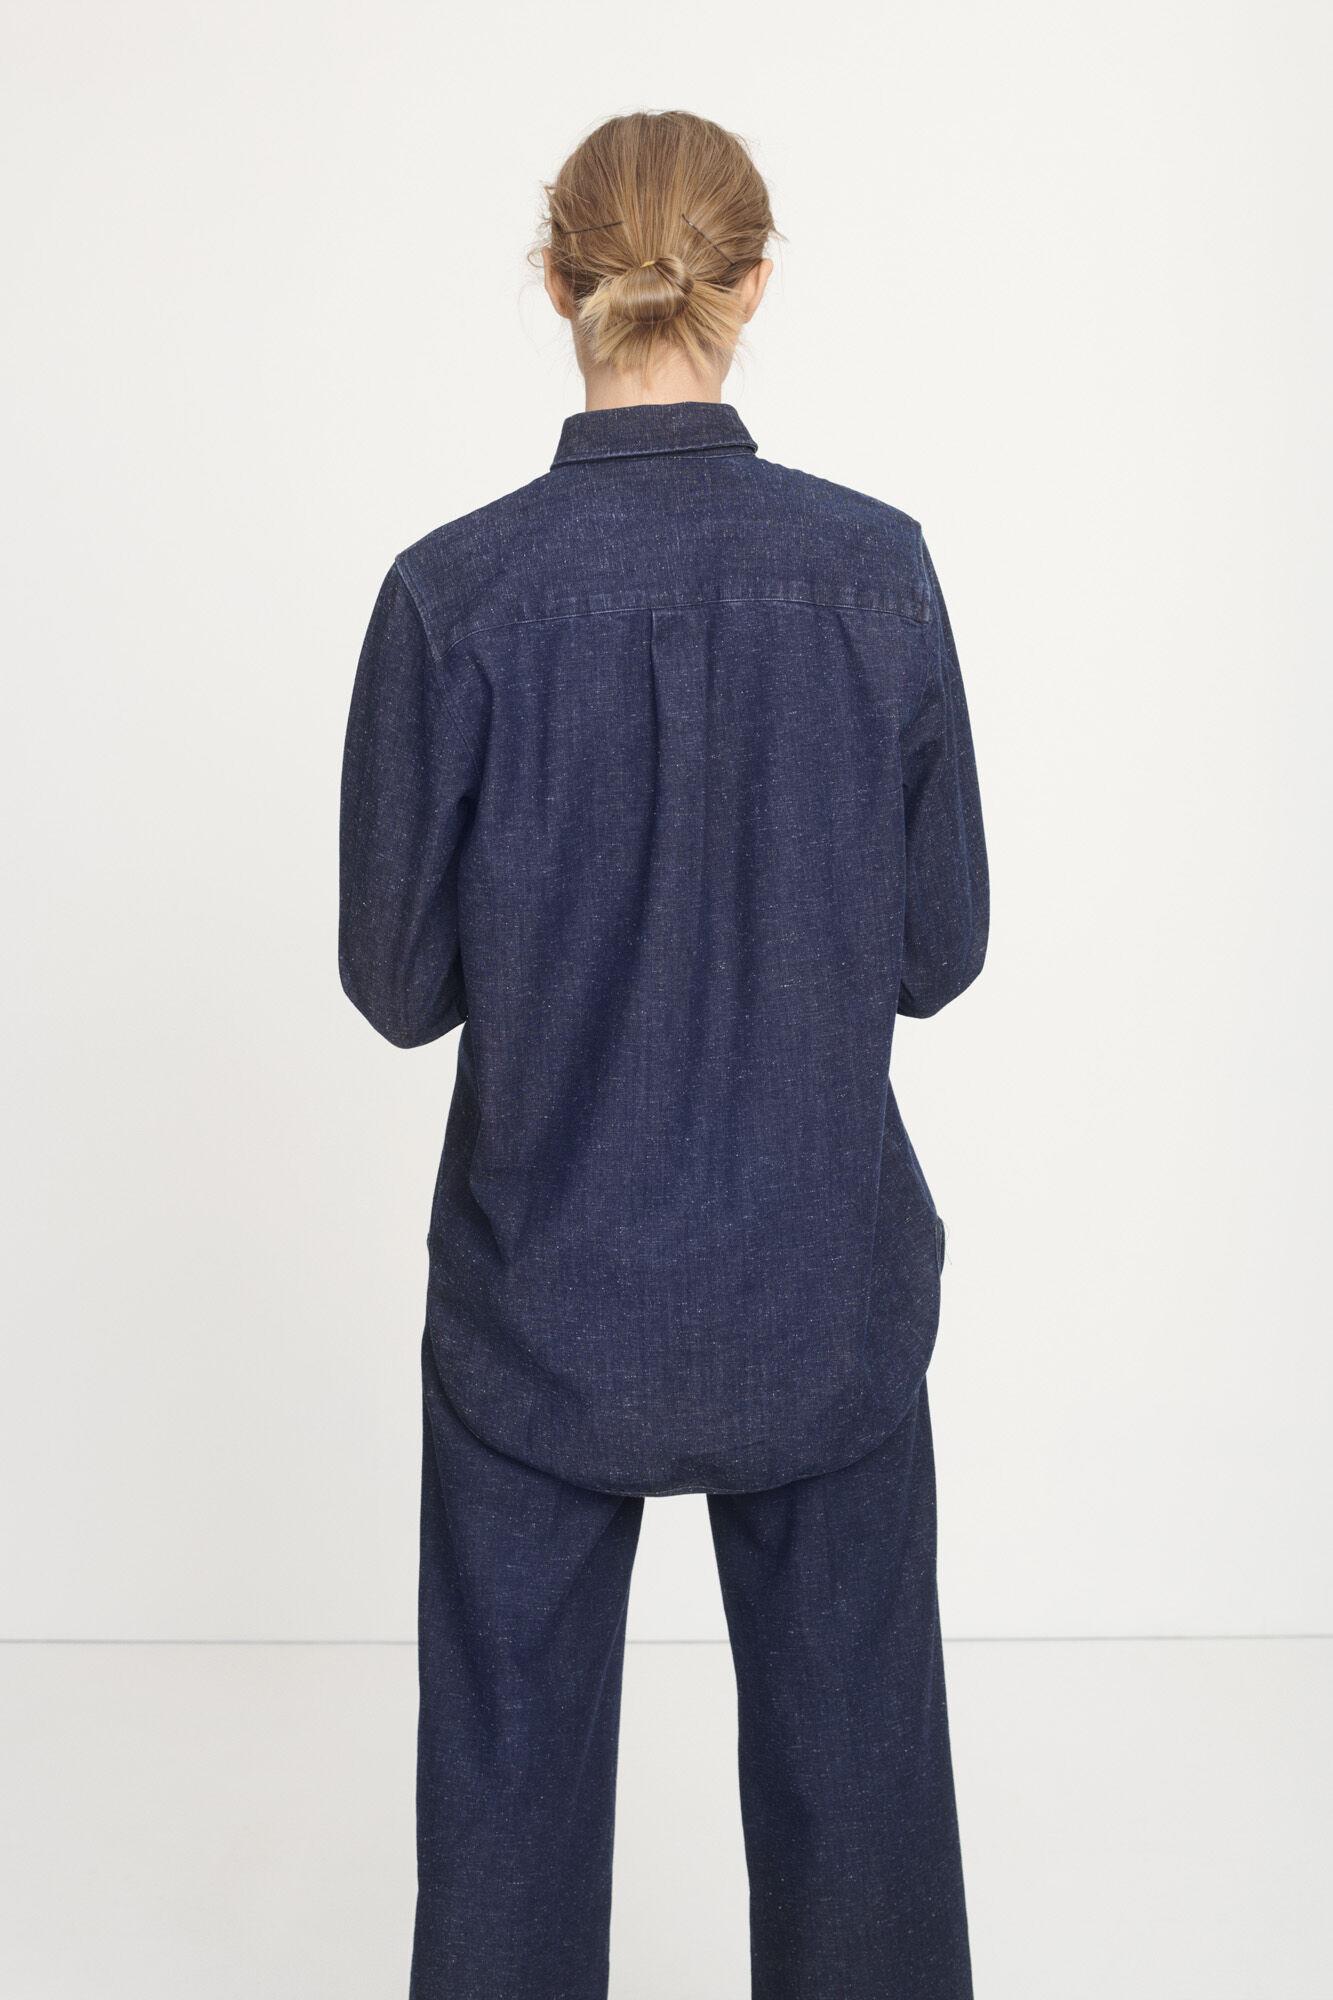 Collot shirt 11125